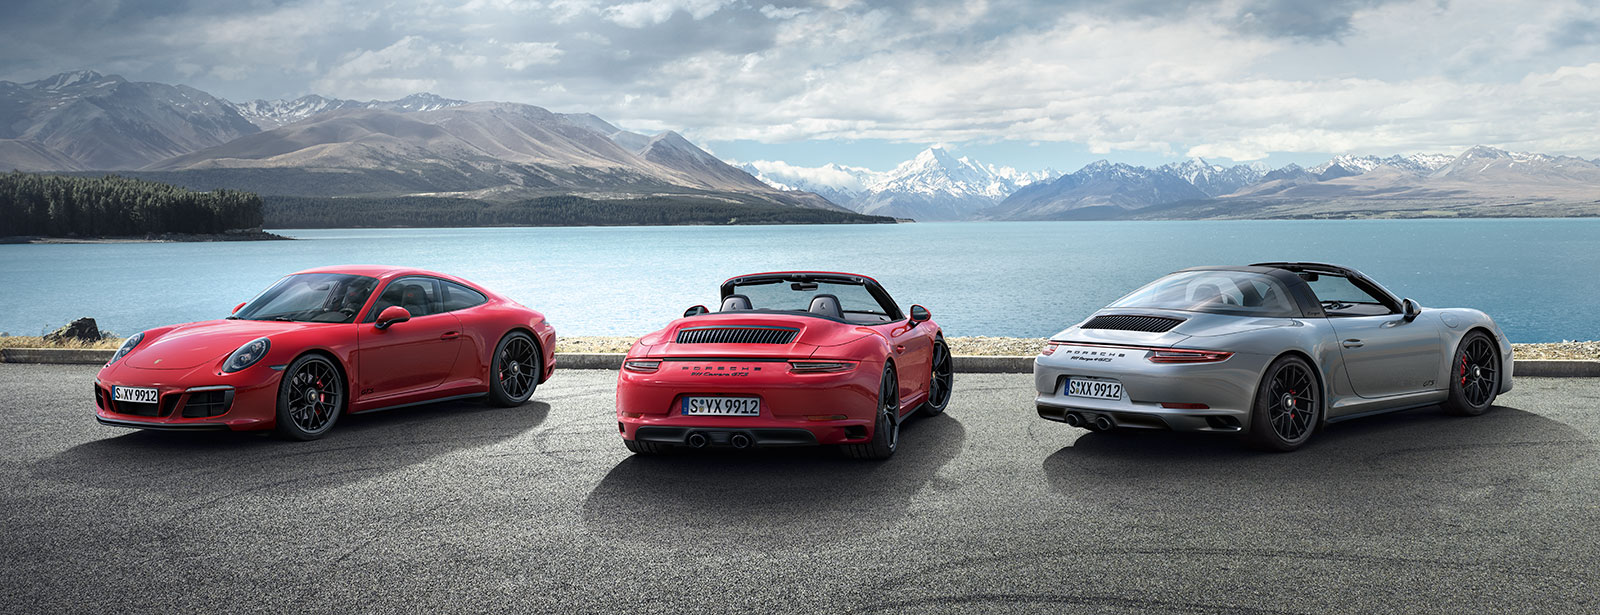 Rent a Porsche 911 Carrera 4 GTS Cabriolet - Coupe or Targa 46afda7683